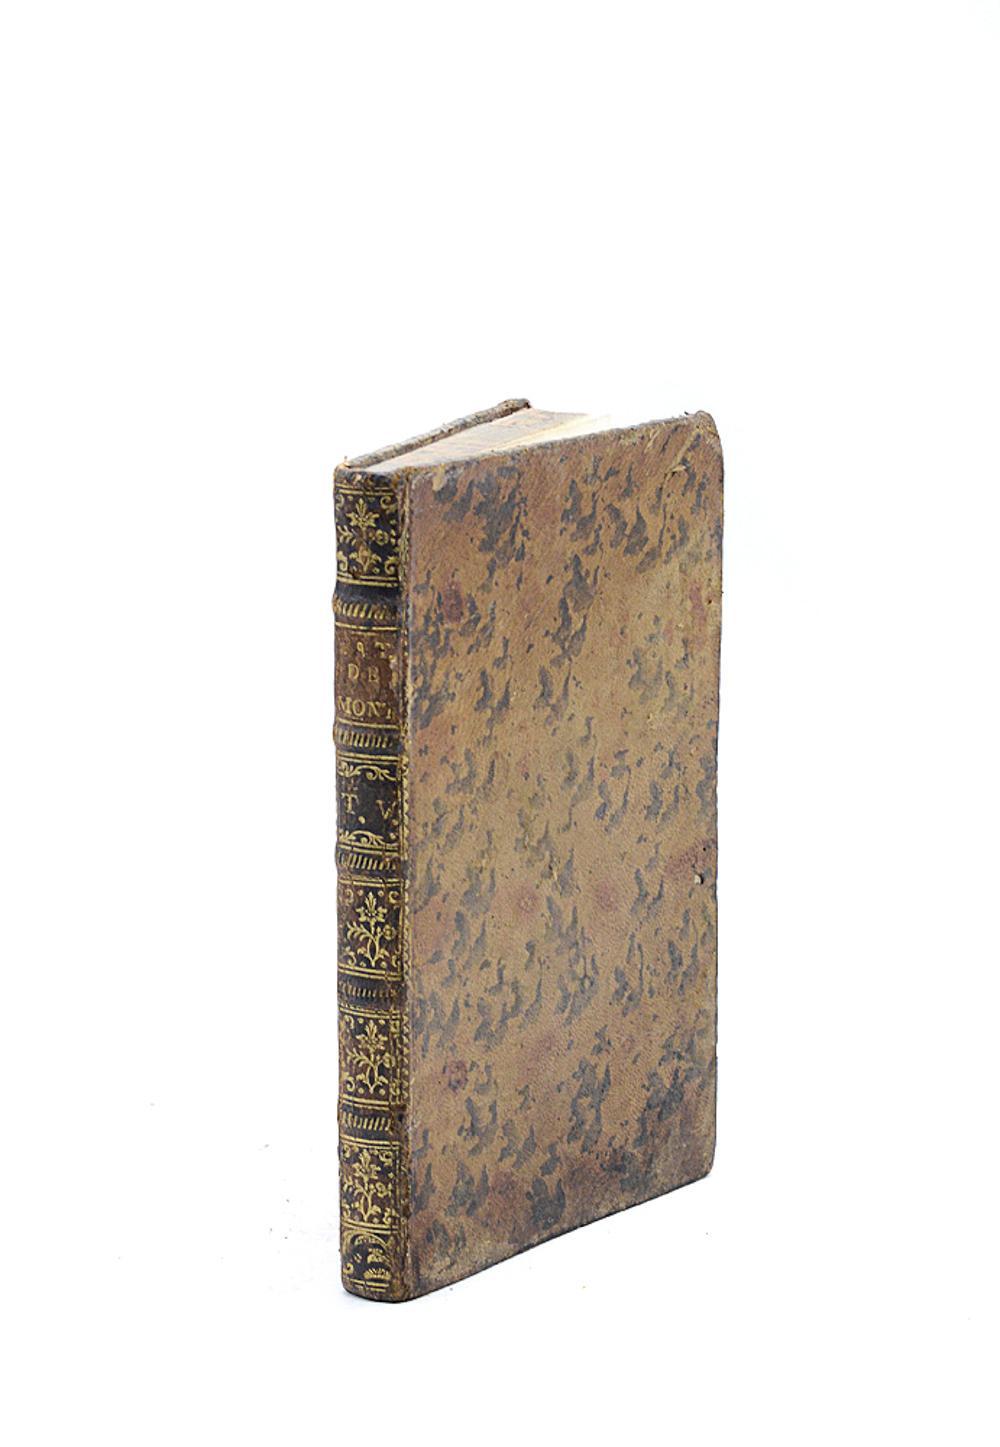 CATECISMOS DA DIECESE DE MONTPELLIER, 1 vol. enc.